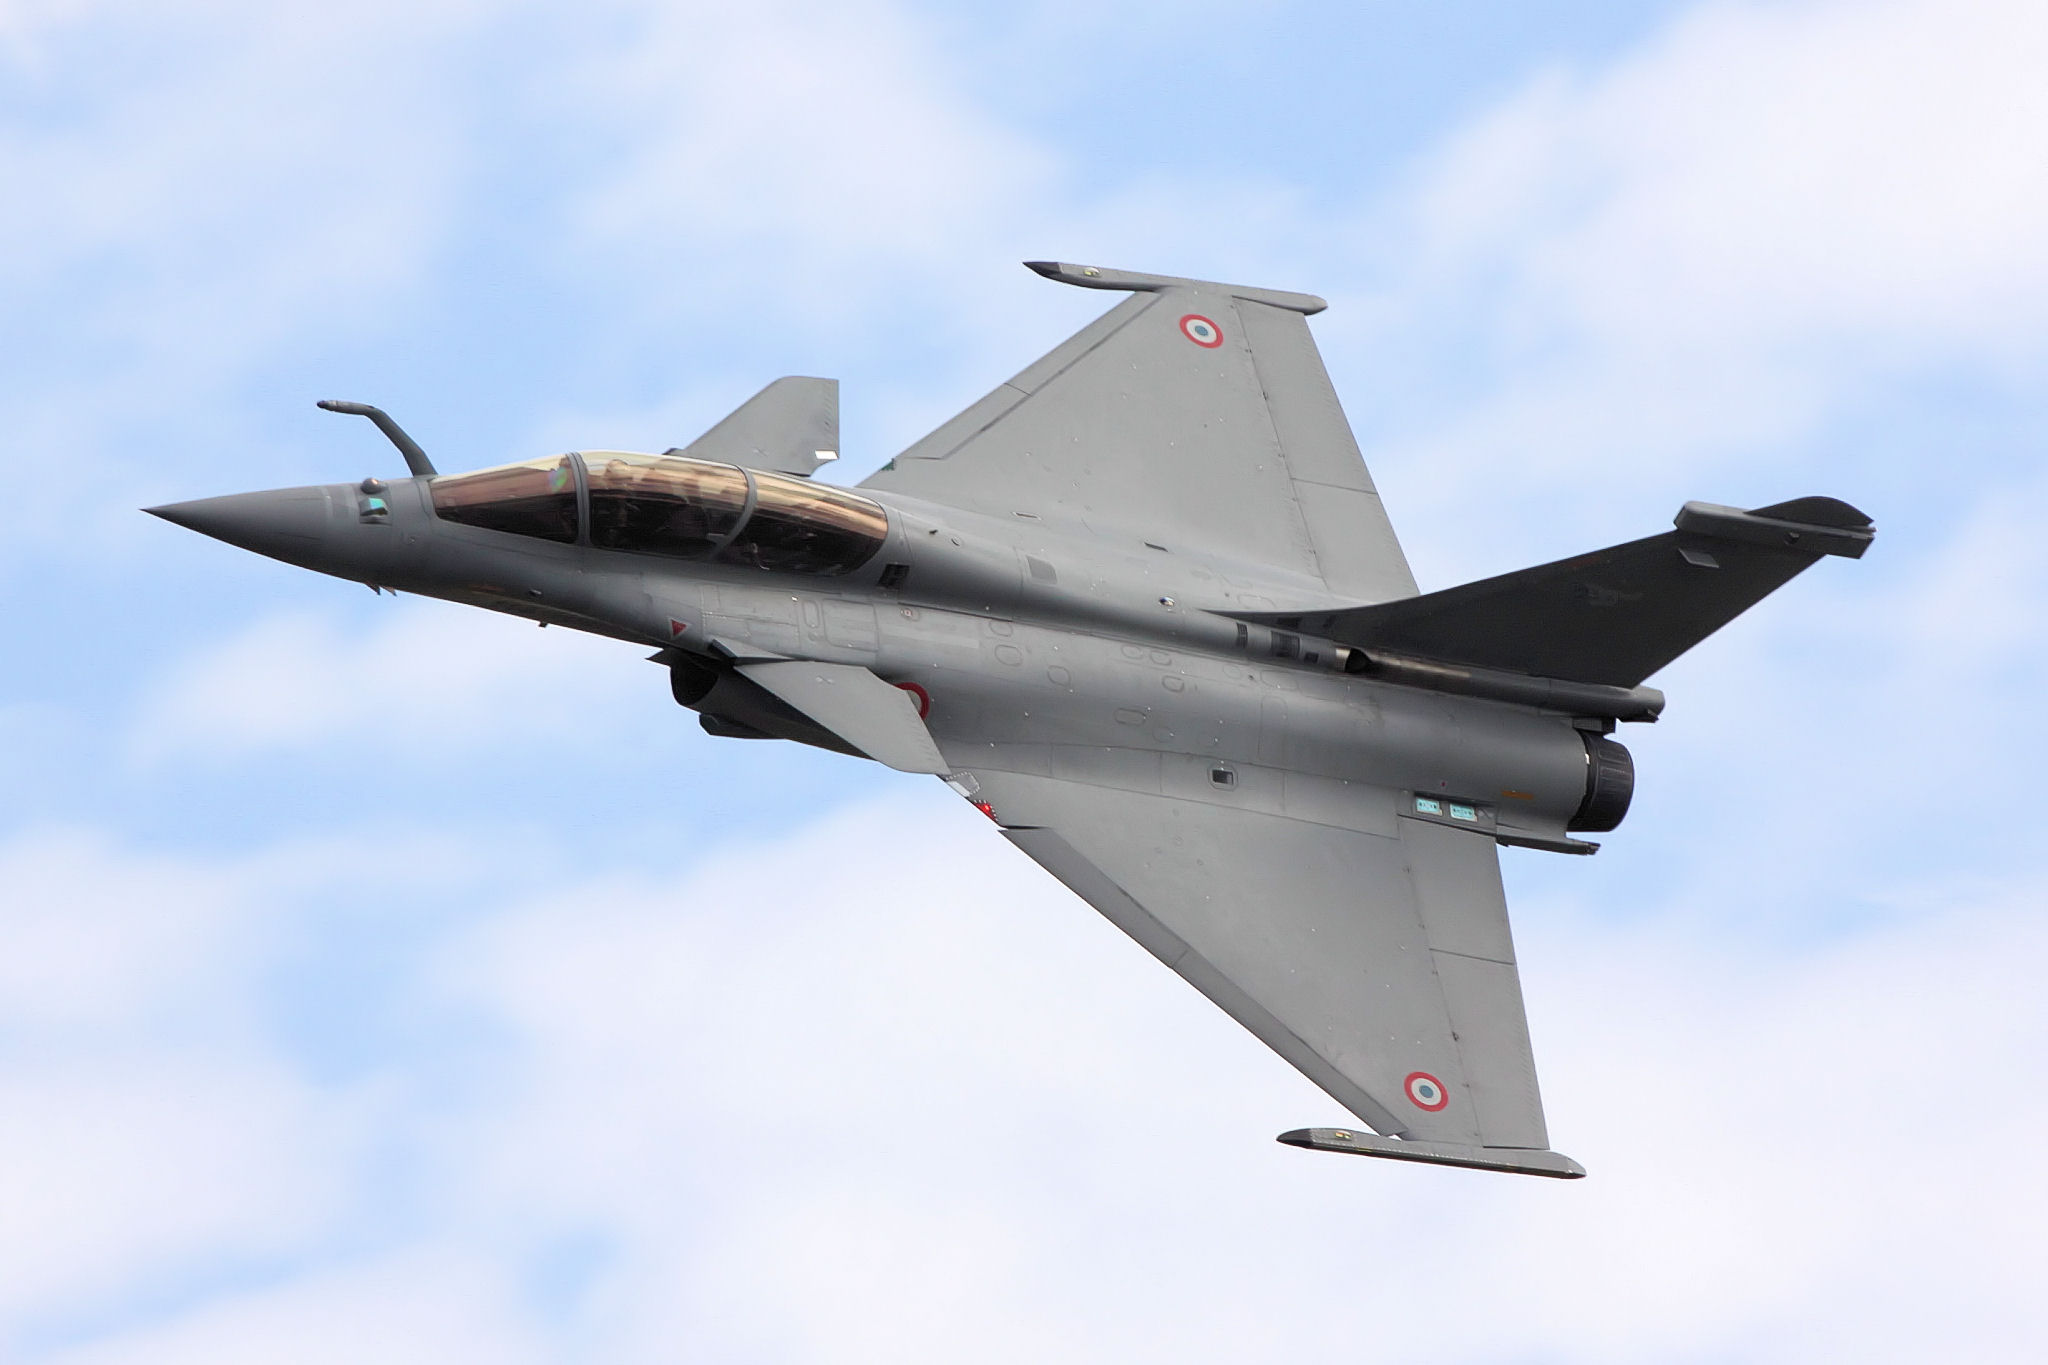 Dassault Rafale Hd Wallpaper